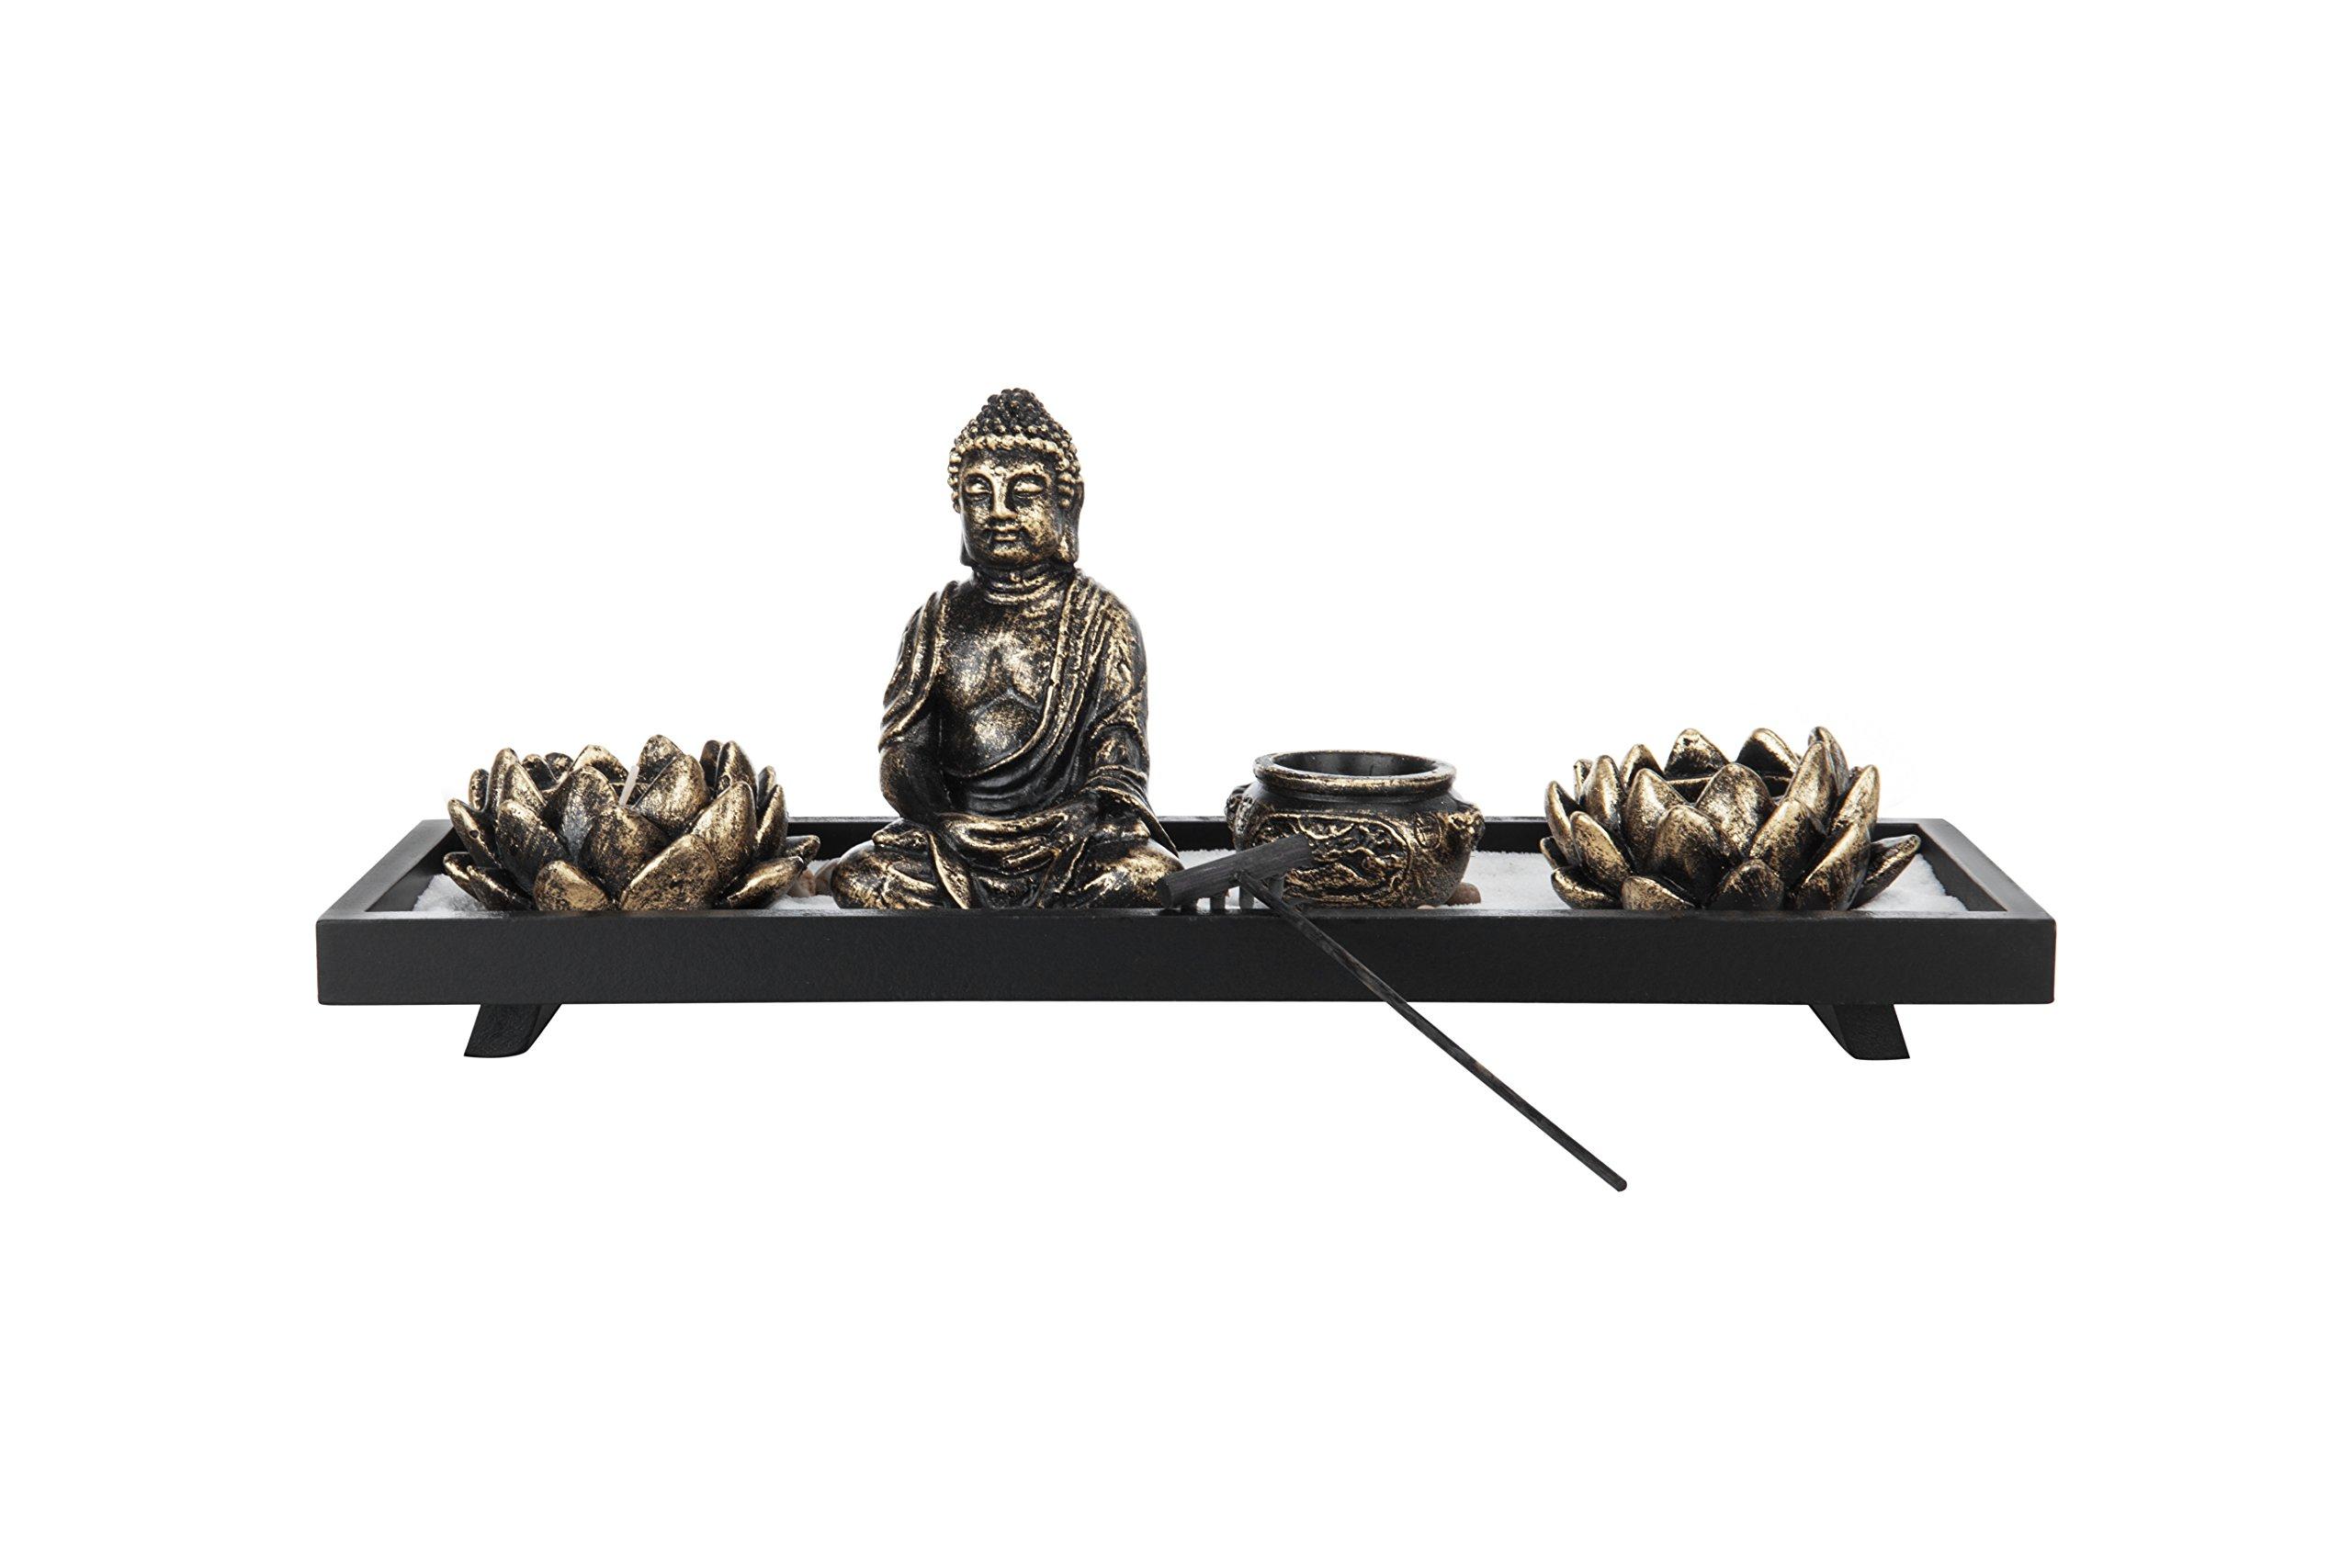 MyGift Home Zen Garden Set - Buddha Statue / Lotus Tea Light Candle Holder / Incense Burner Holder